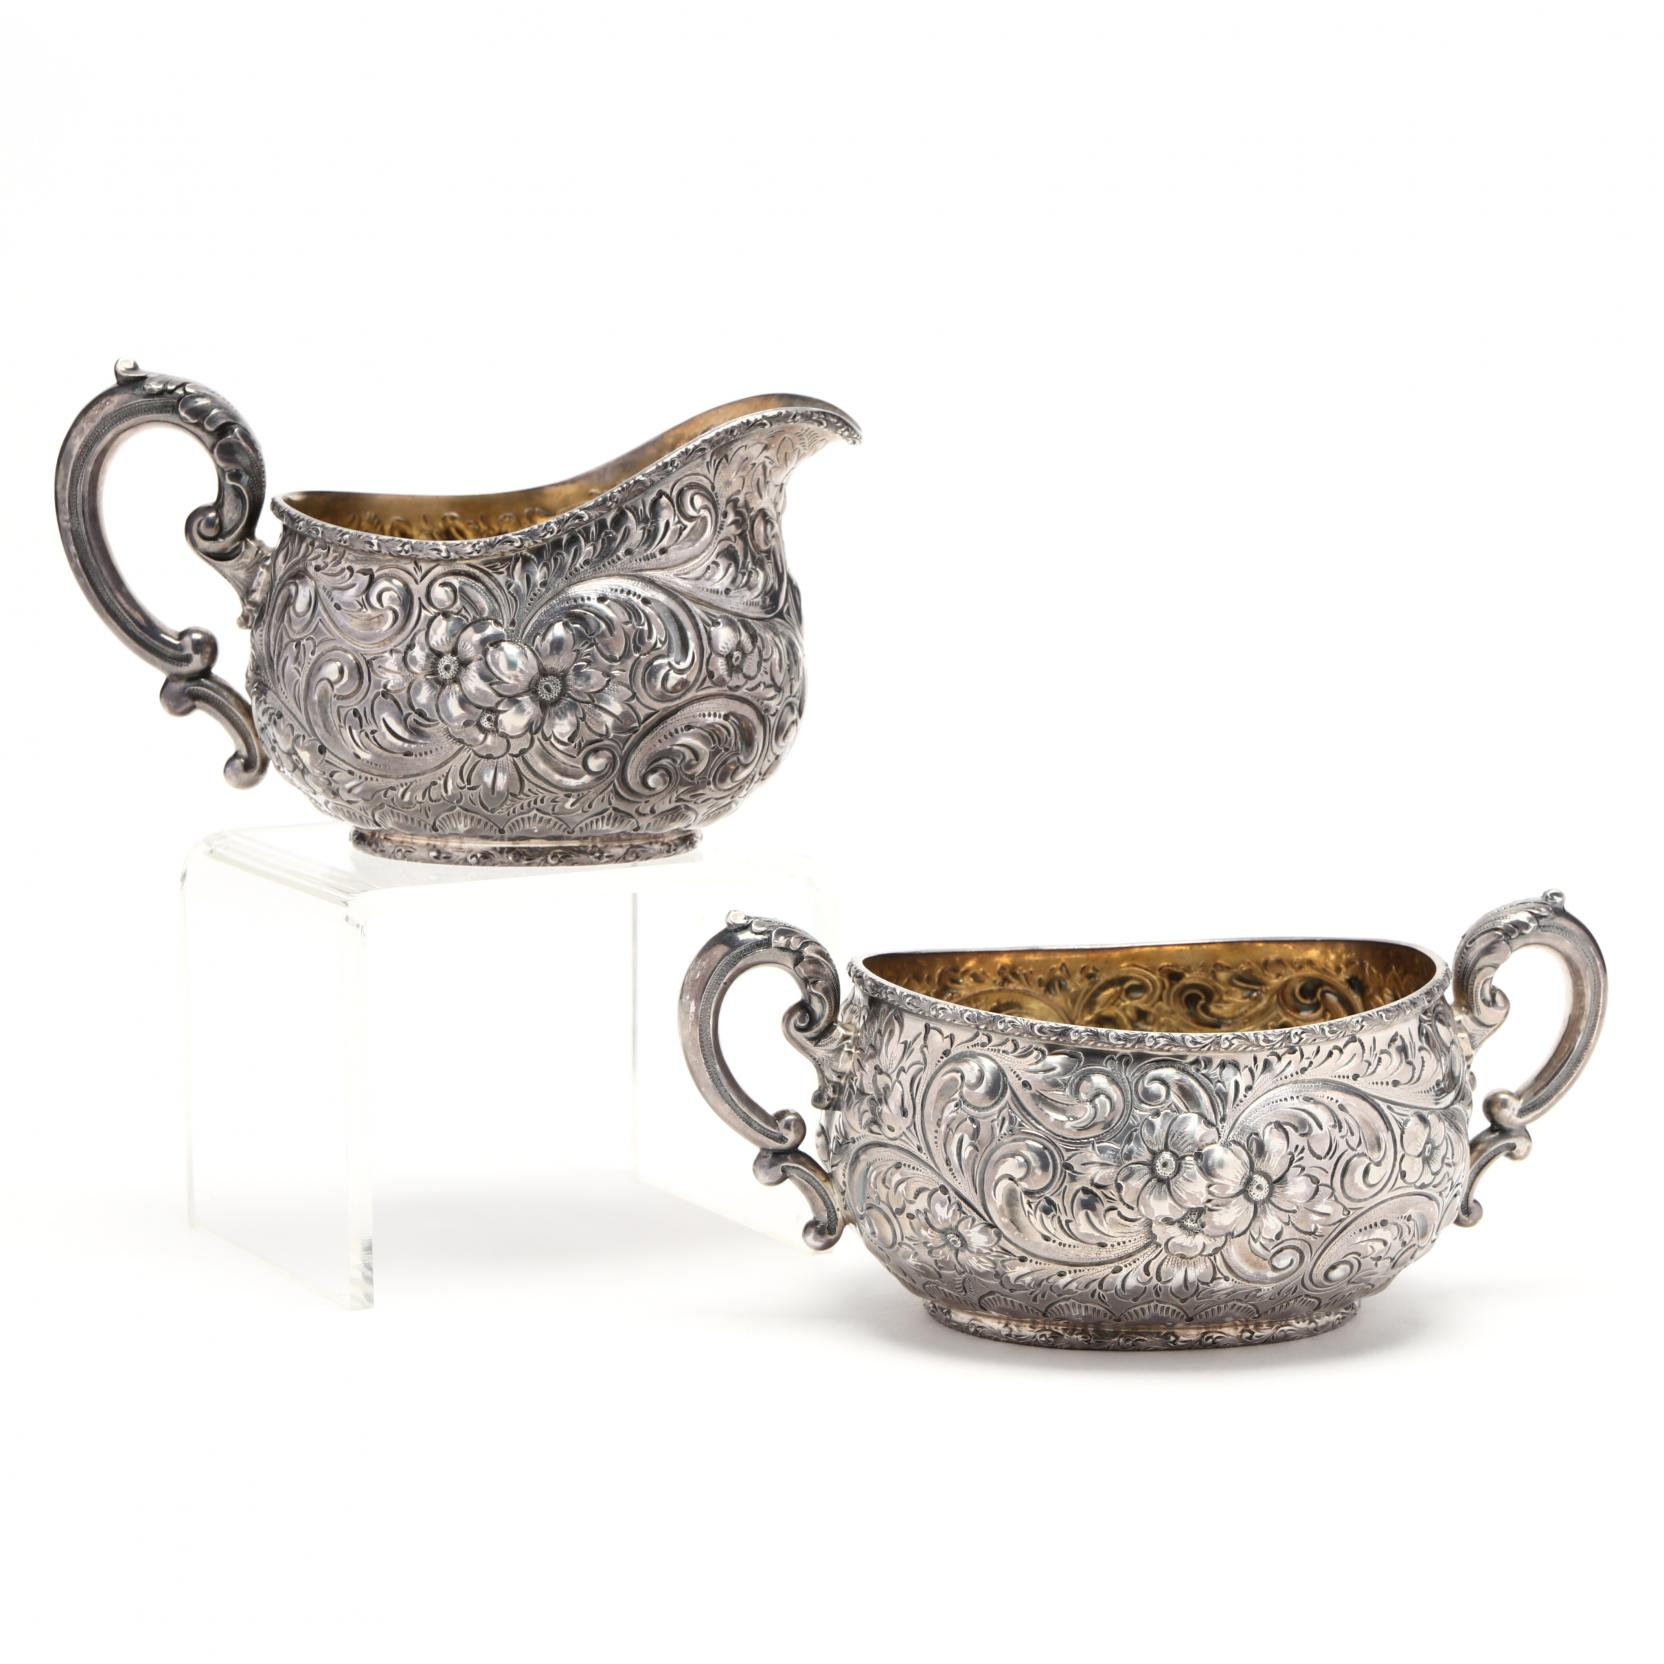 an-antique-dominick-haff-sterling-silver-sugar-creamer-set